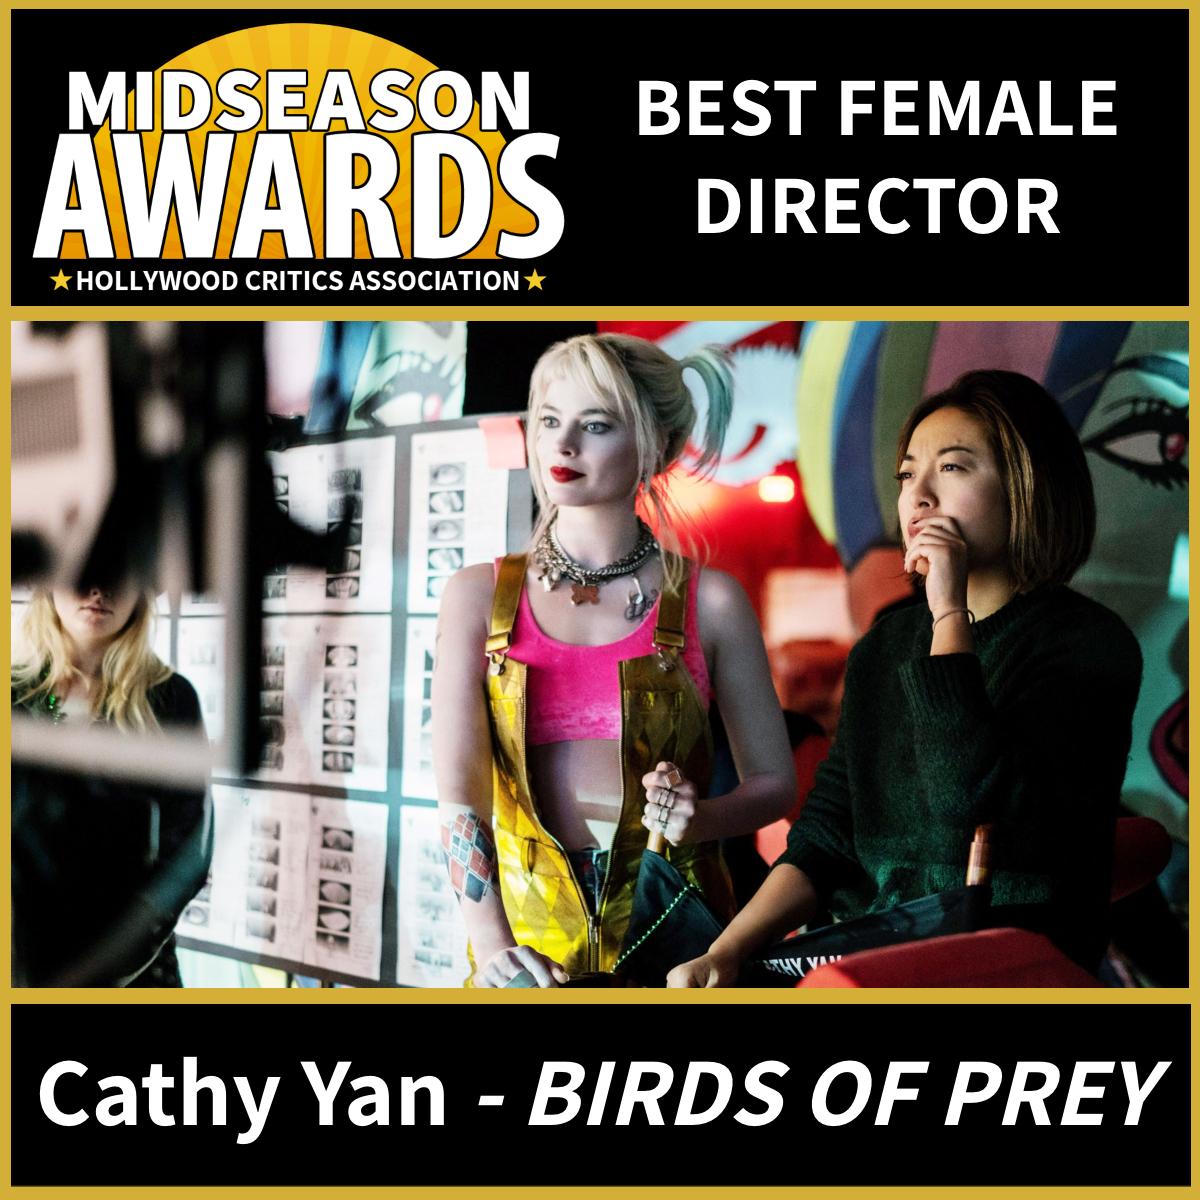 Best Female Director - Cathy Yan for Birds of Prey